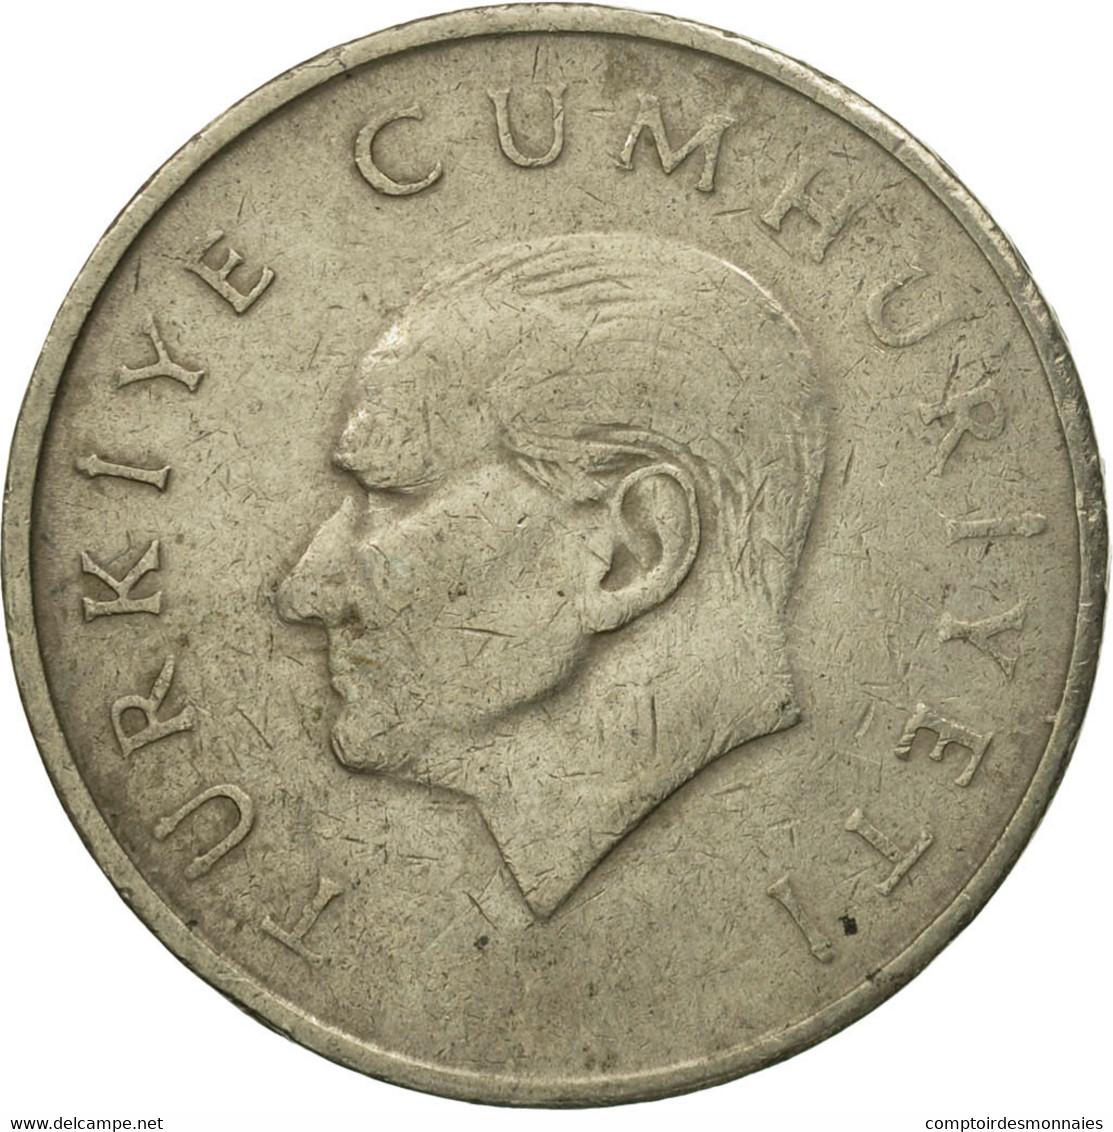 Monnaie, Turquie, 25000 Lira, 25 Bin Lira, 1995, TB+, Copper-Nickel-Zinc - Turquie